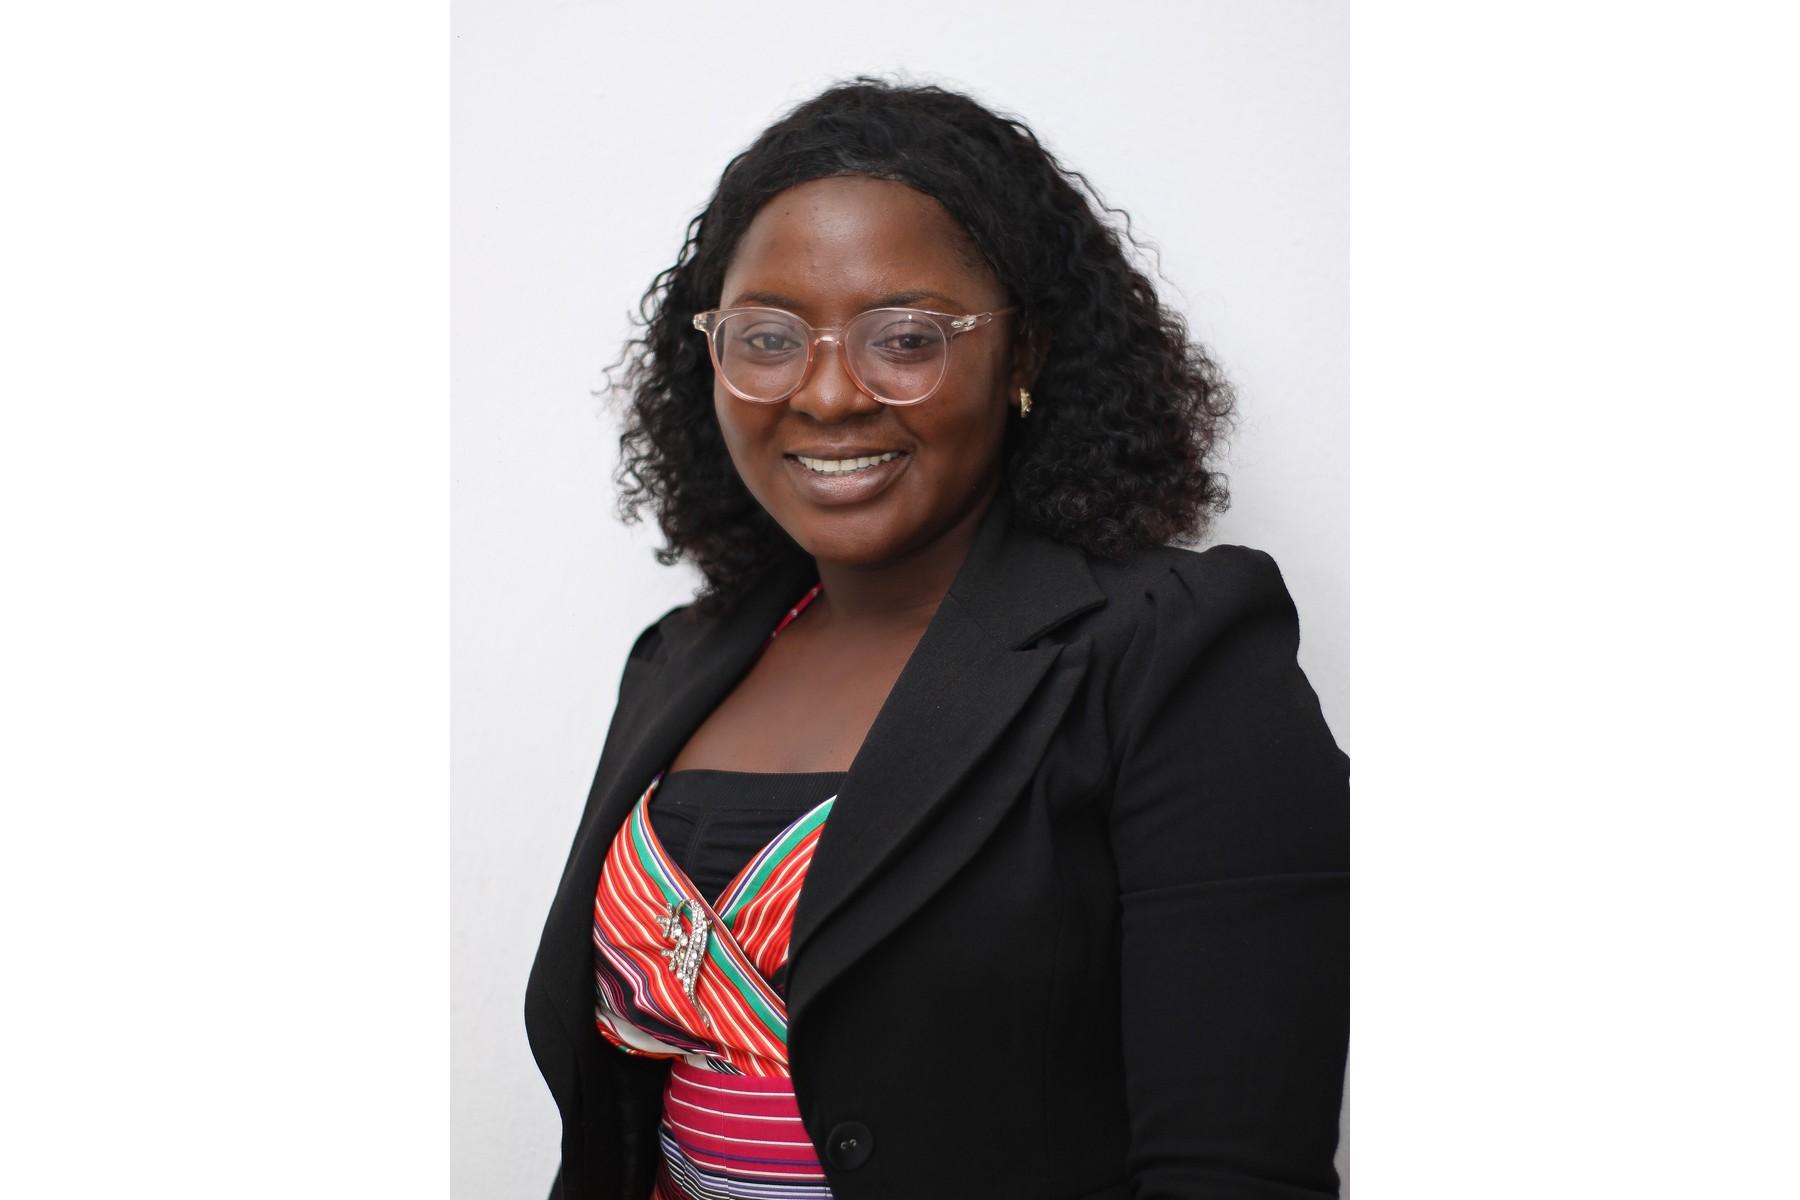 Oluwatobiloba Adegbite